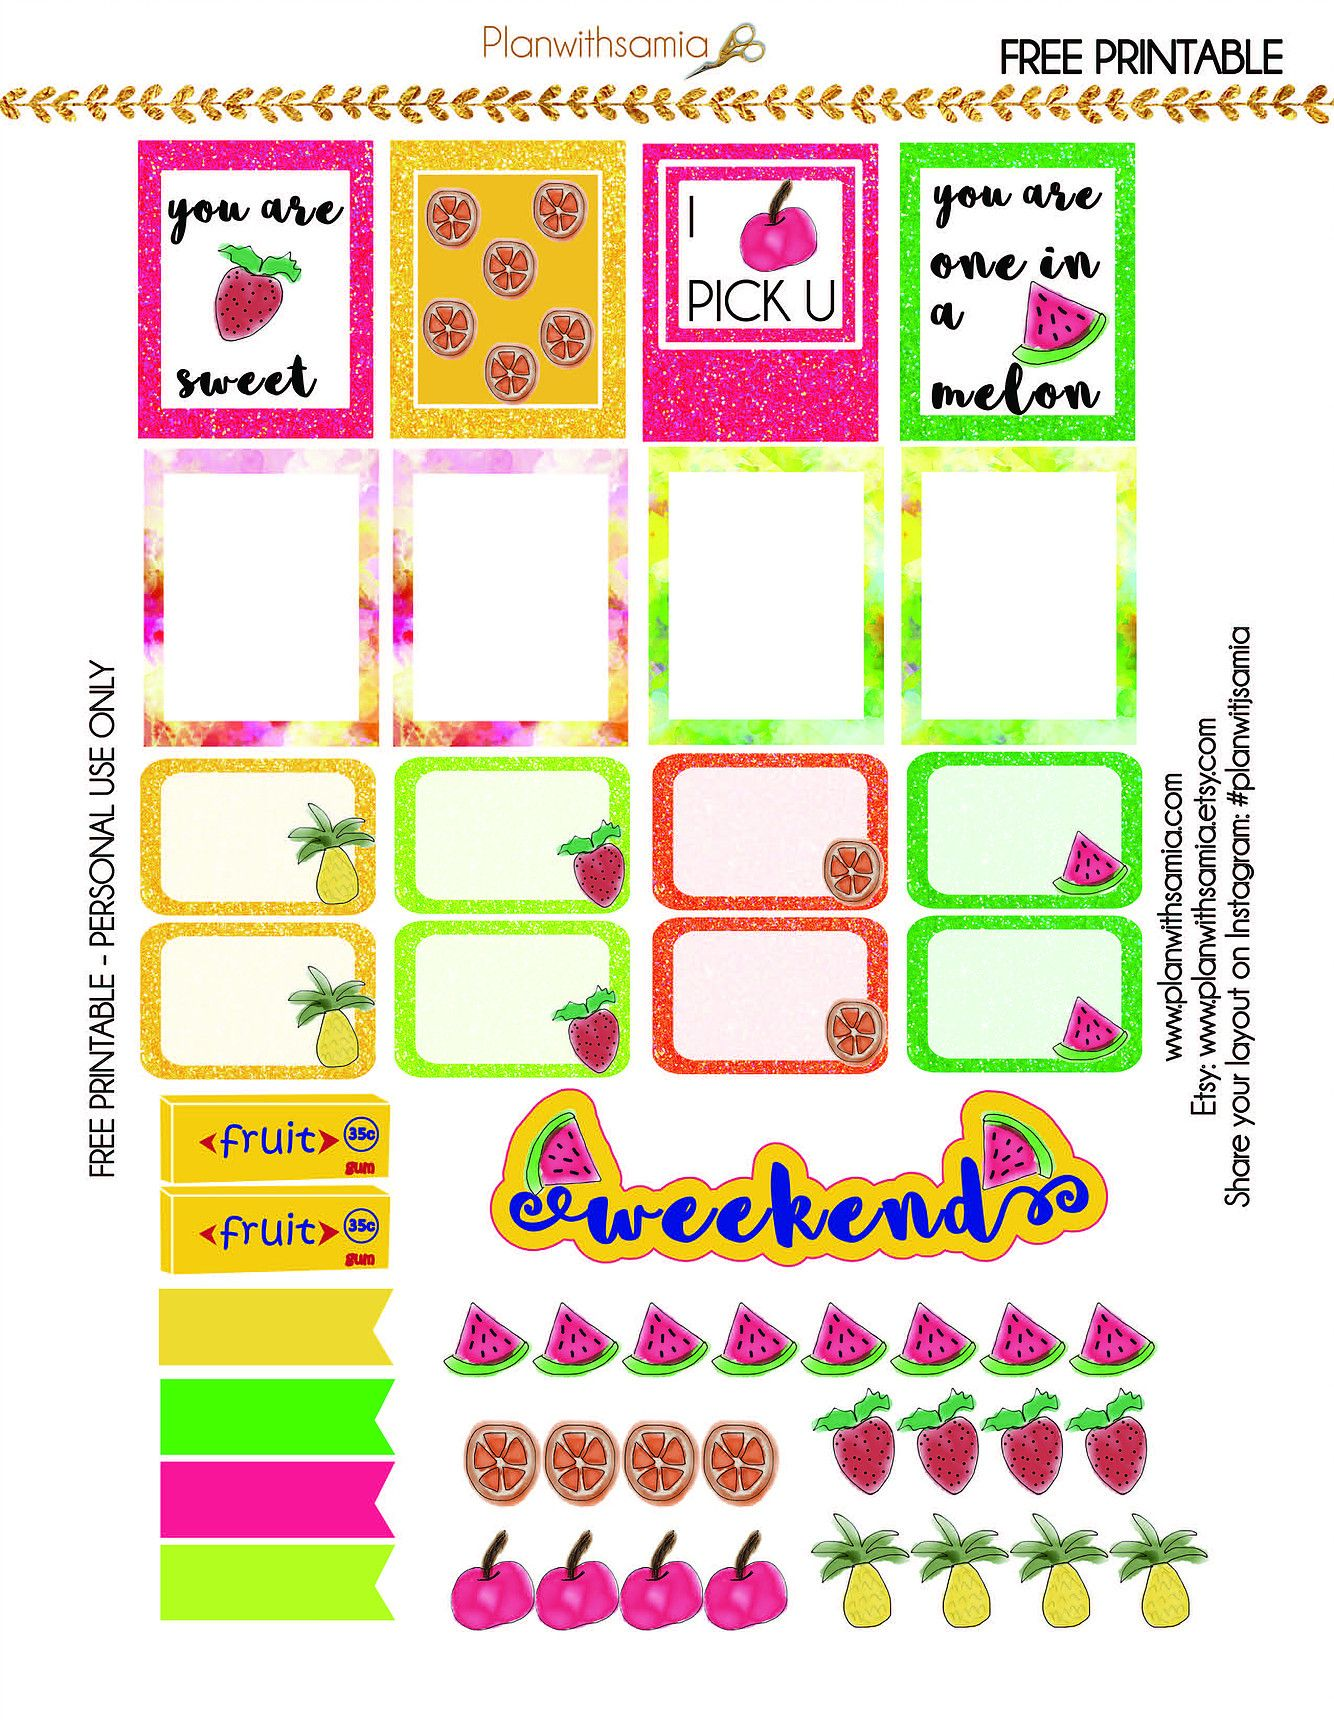 FREE Freebie - Juicy Fruits by planwithsamia